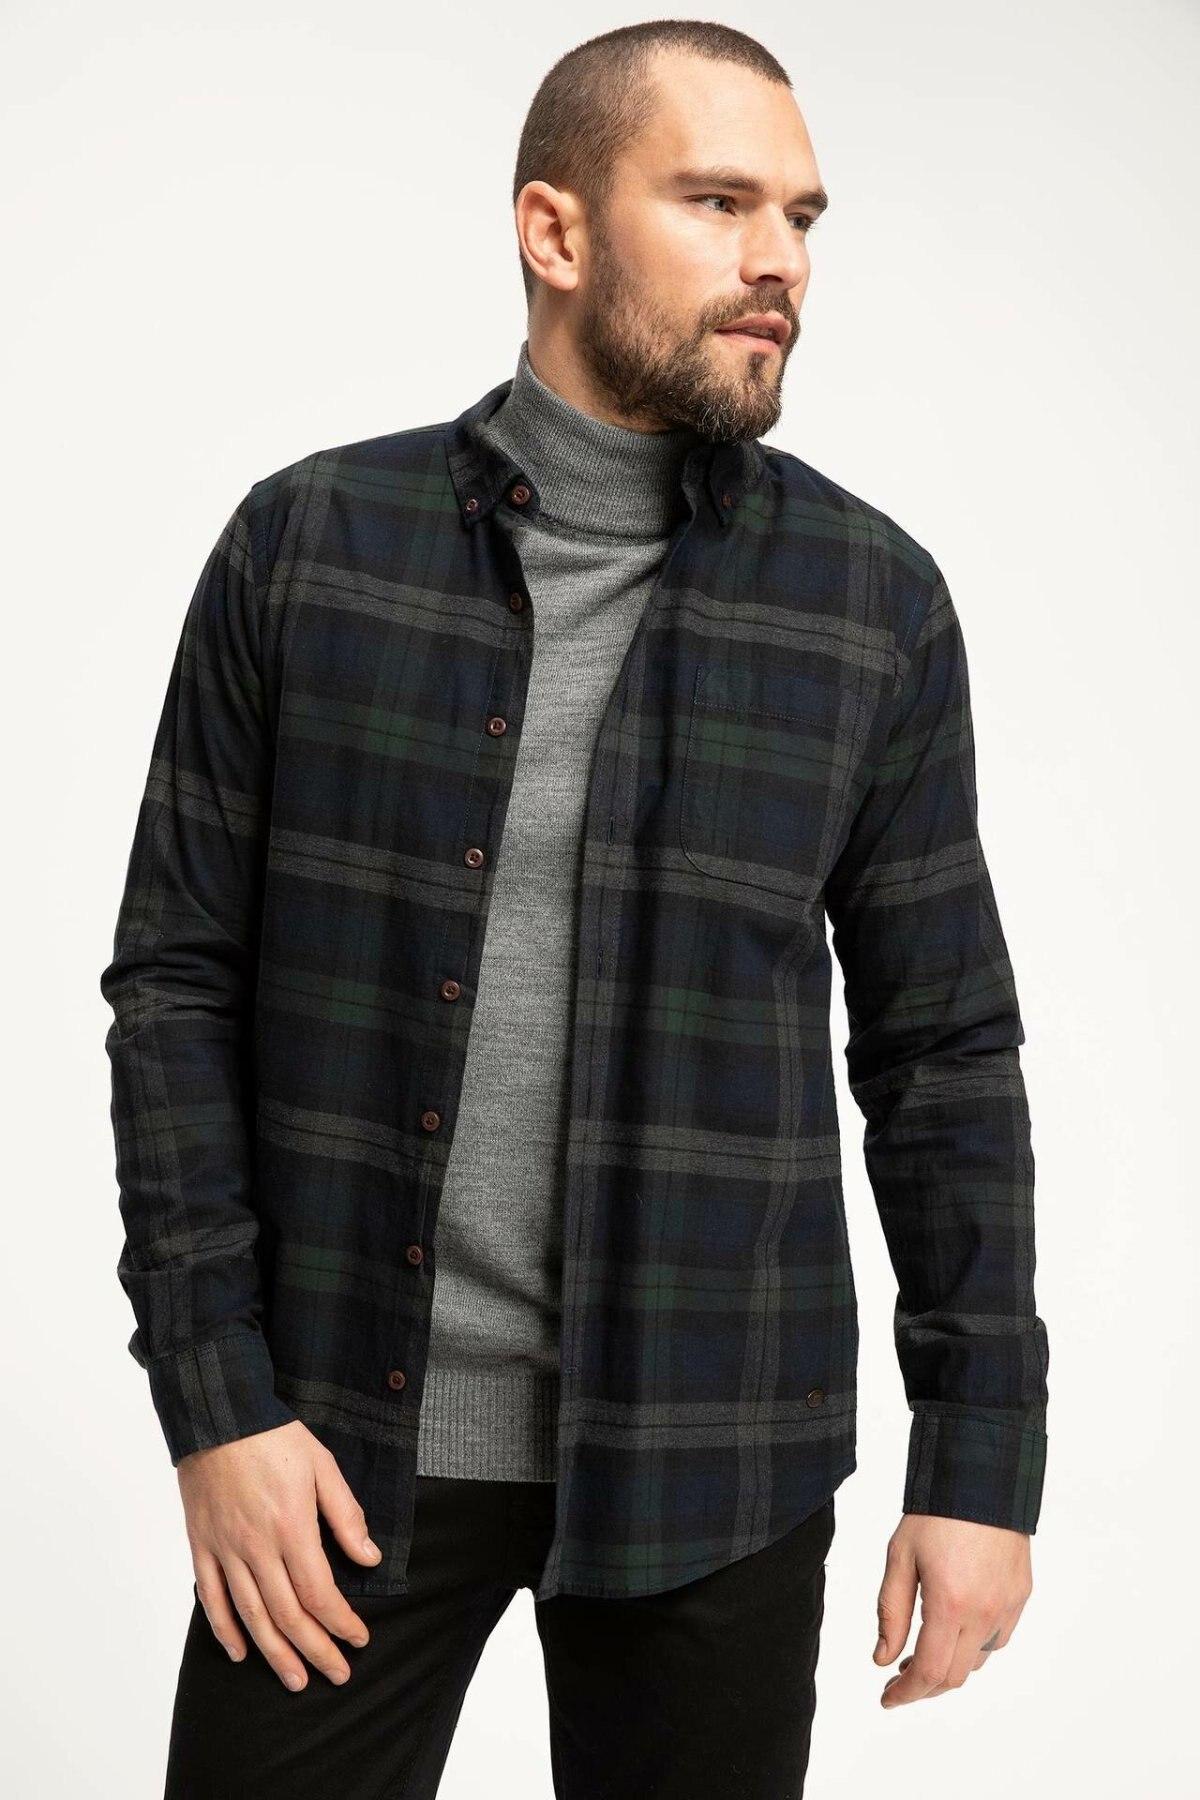 DeFacto Man Dark Color Cotton Grids Shirts Men's Top Shirts Male Long Sleeve Turn-down Collar Plaids Shirt-J1418AZ18WN